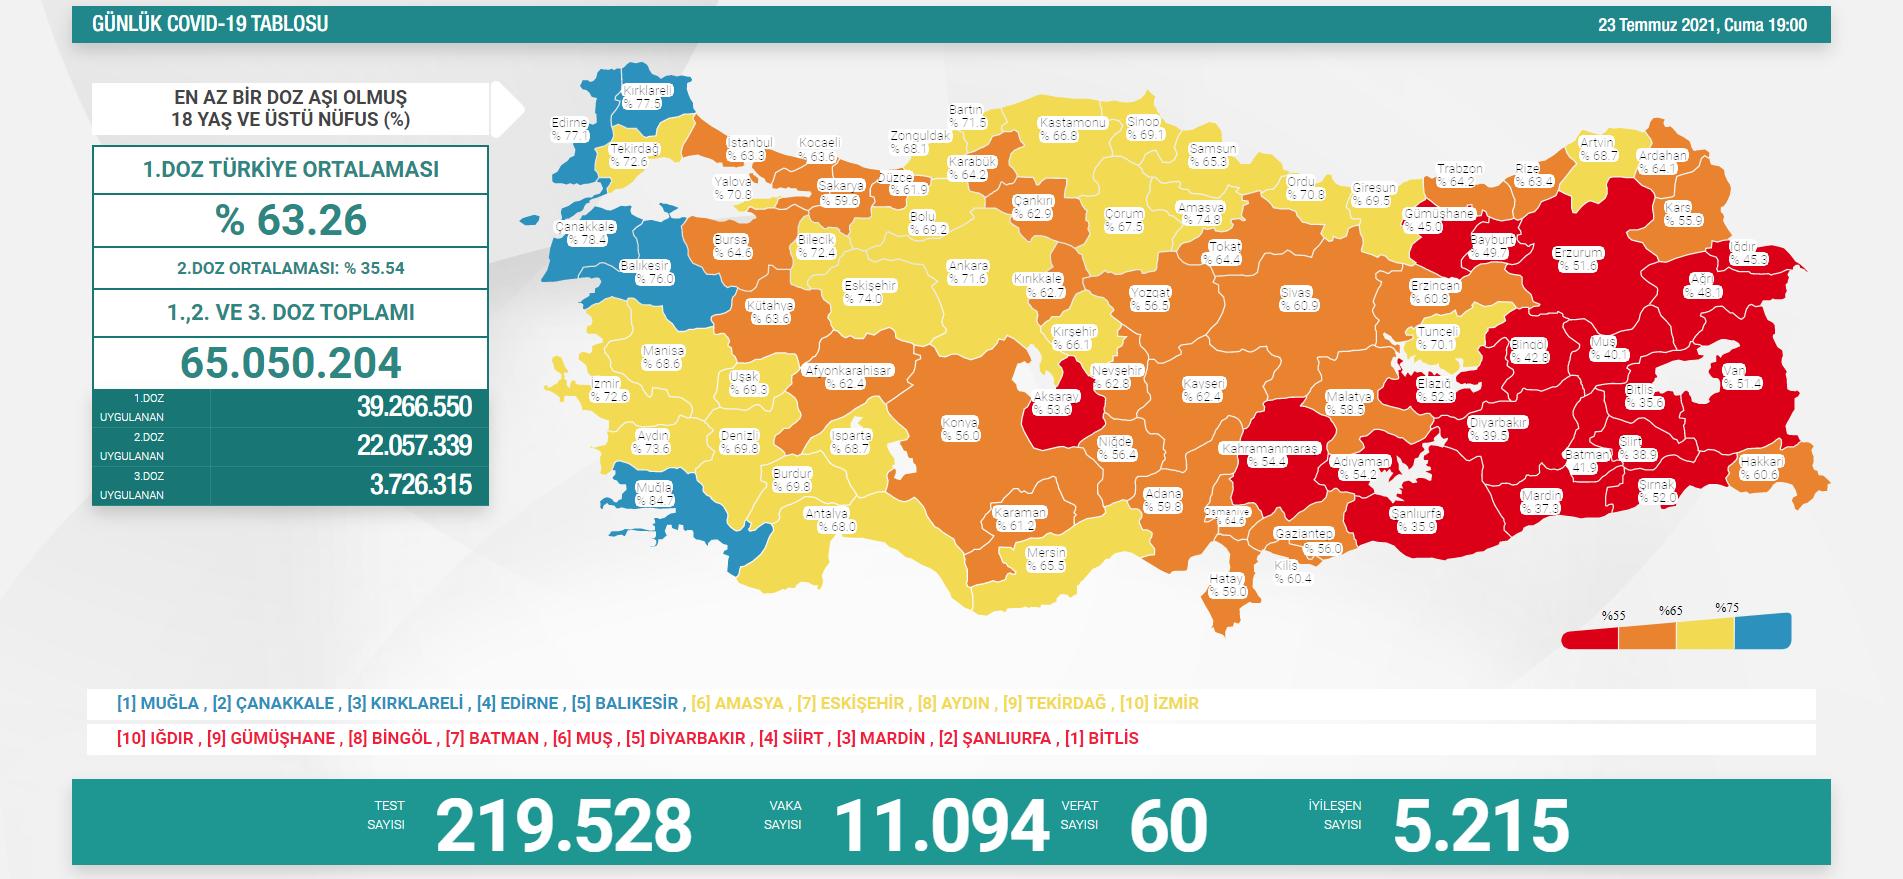 23-temmuz-turkiyede-koronavirus-tablosu.png